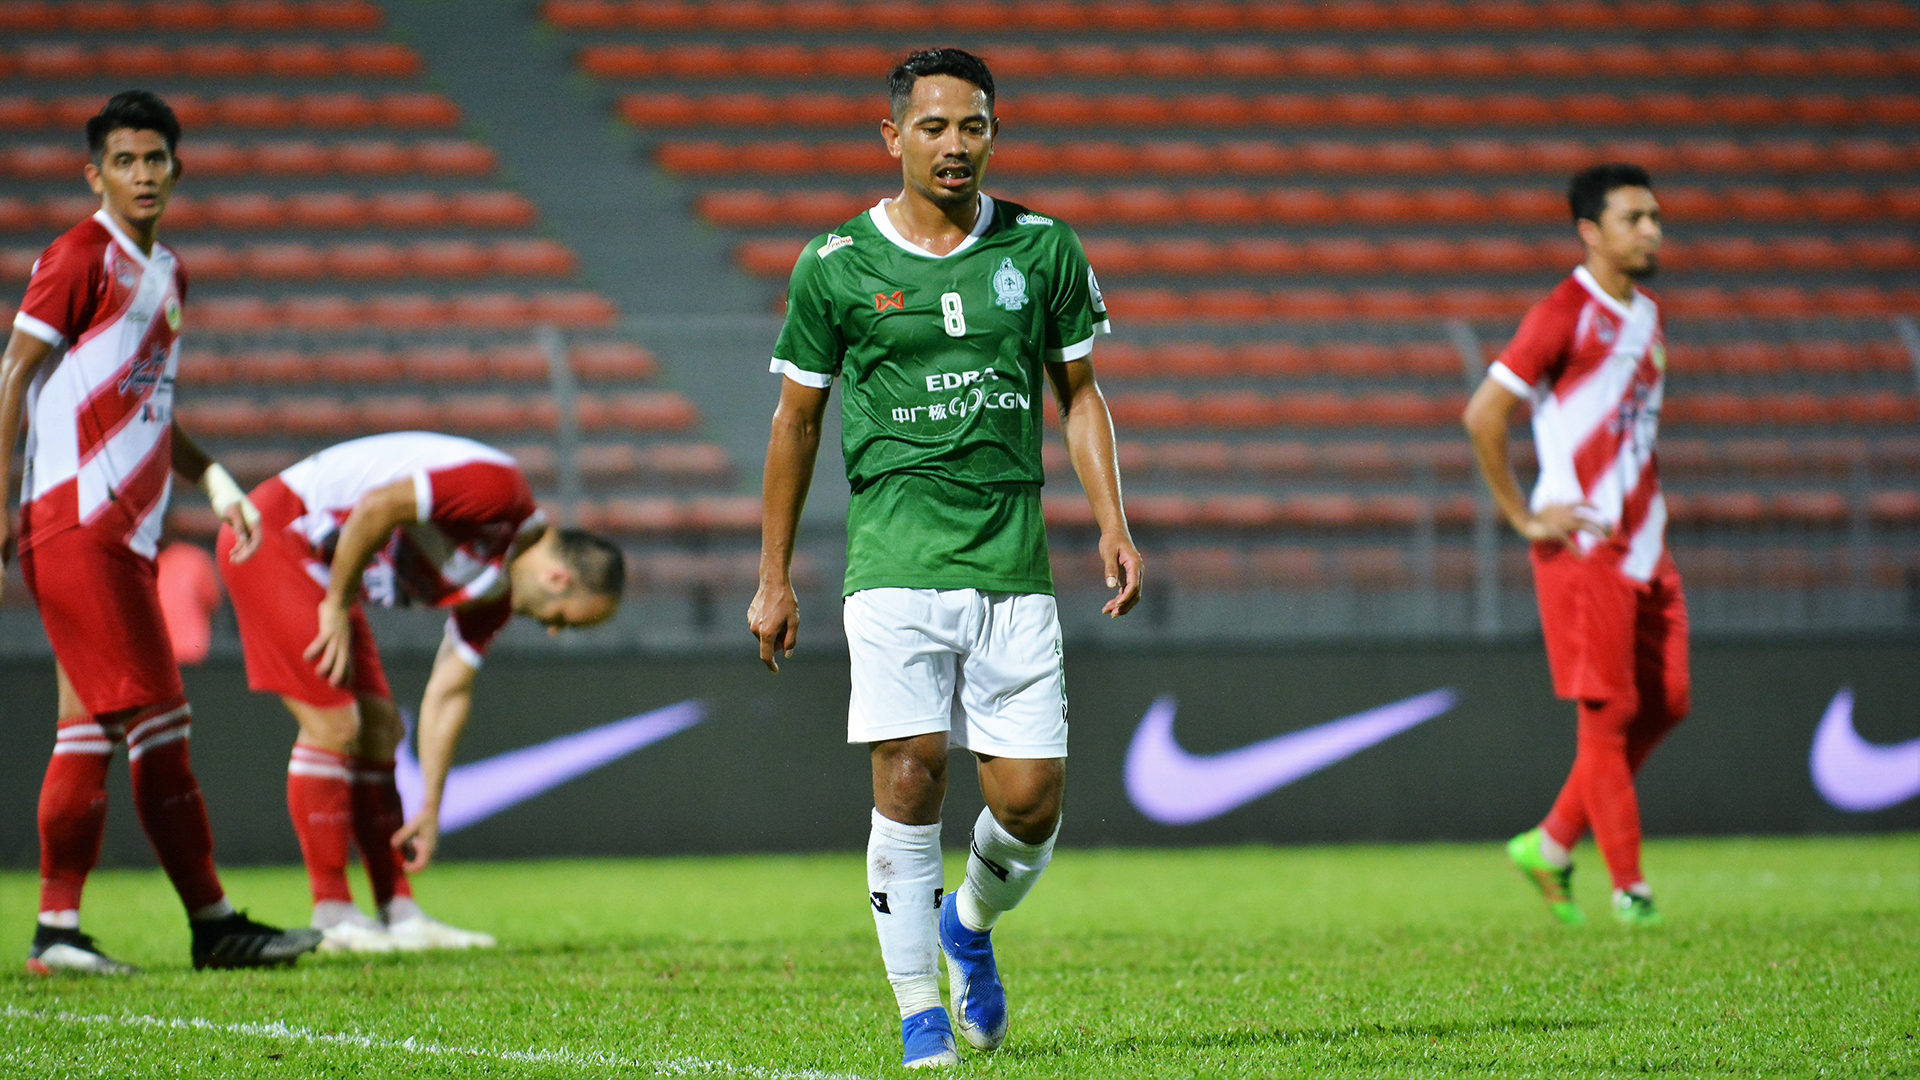 Safiq Rahim, Kuala Lumpur v Melaka, Malaysia Super League, 19 Jun 2019